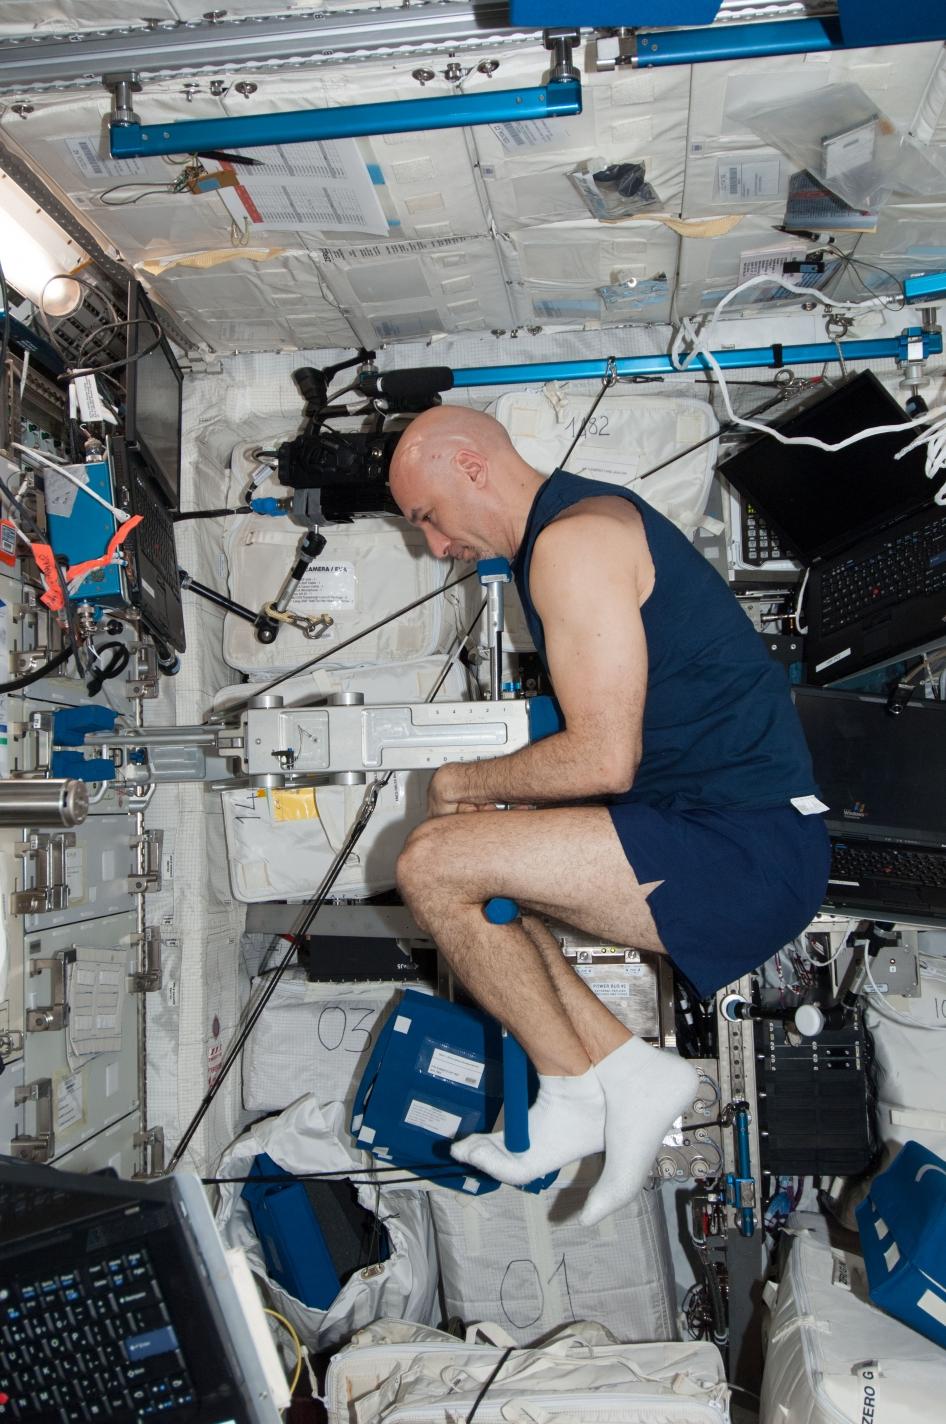 european space agency astronaut jobs - photo #17